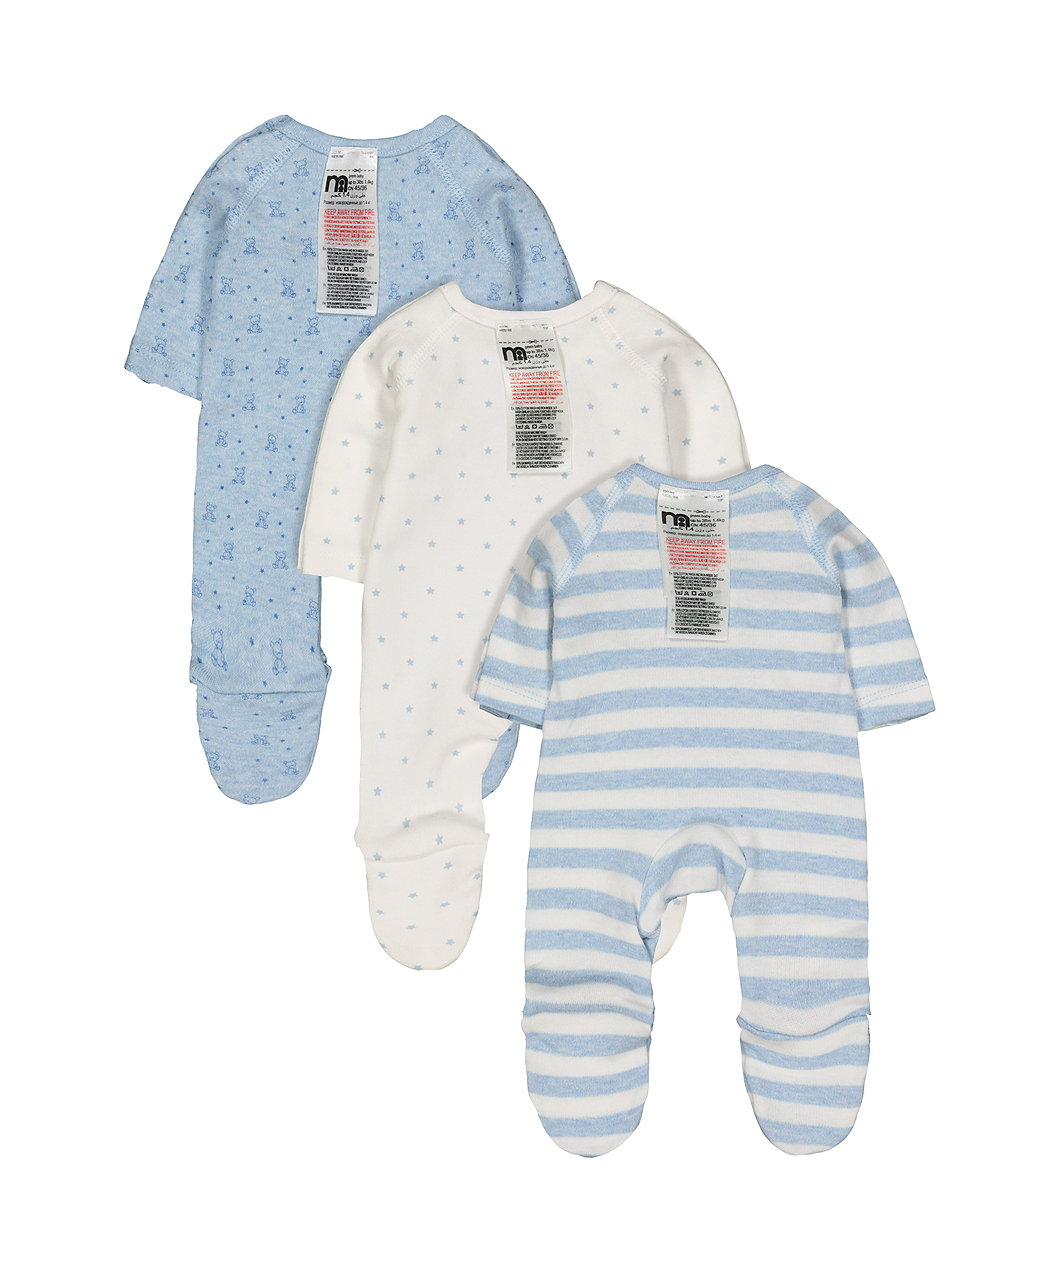 7ff4c61b4 blue premature baby sleepsuits - 3 pack